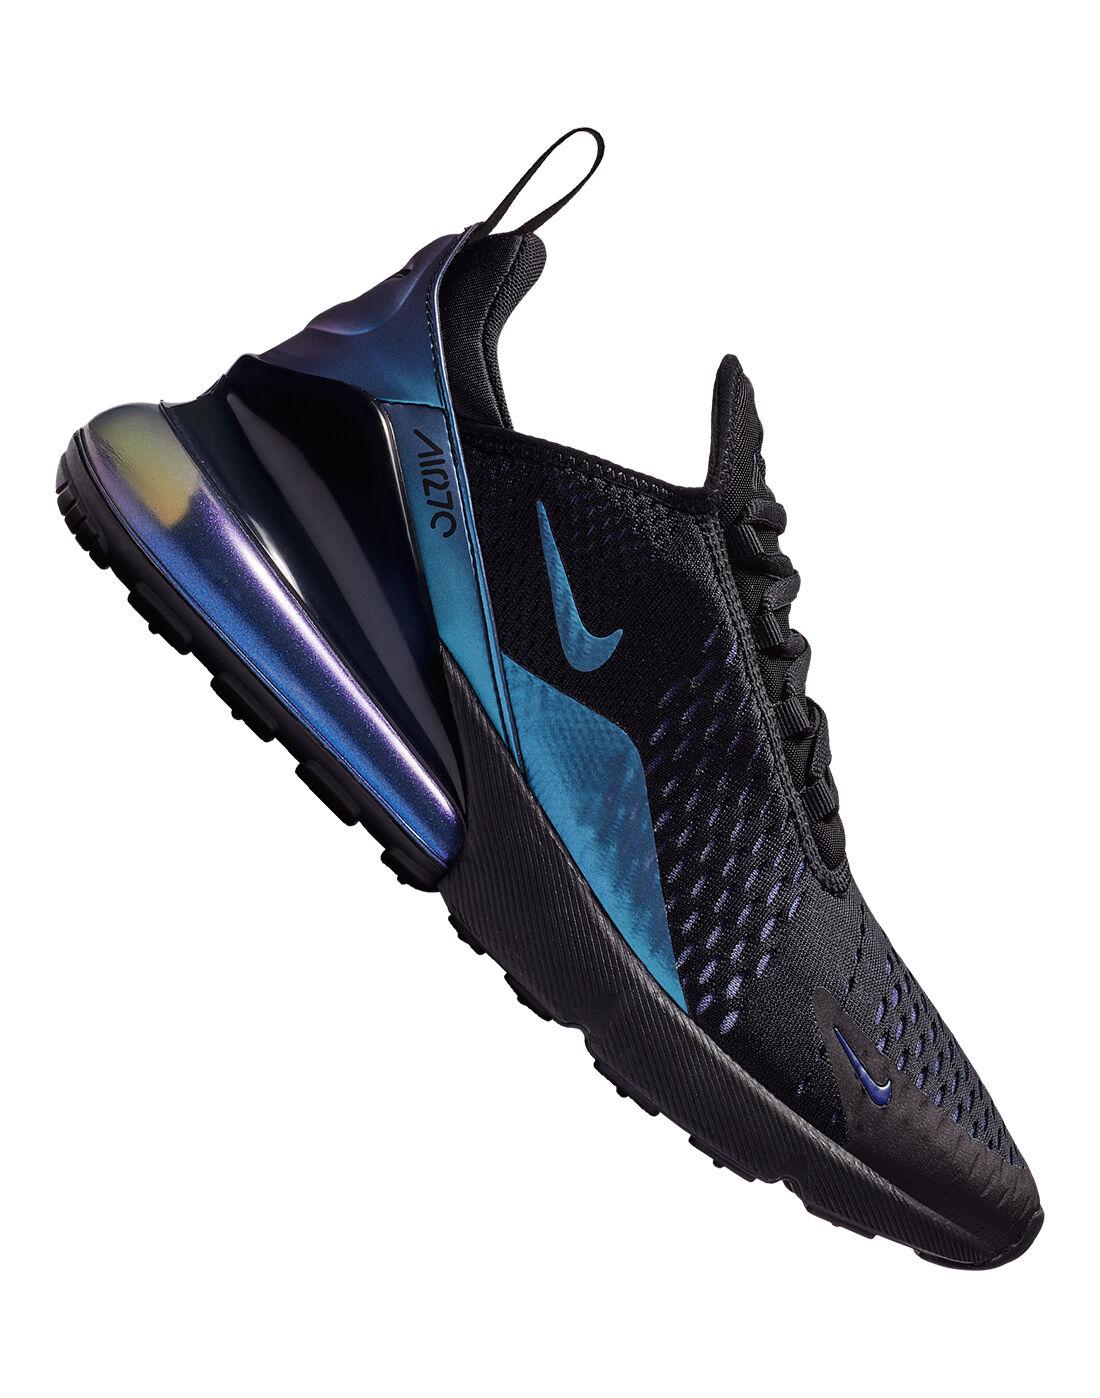 Black \u0026 Blue Metallic Nike Air Max 270